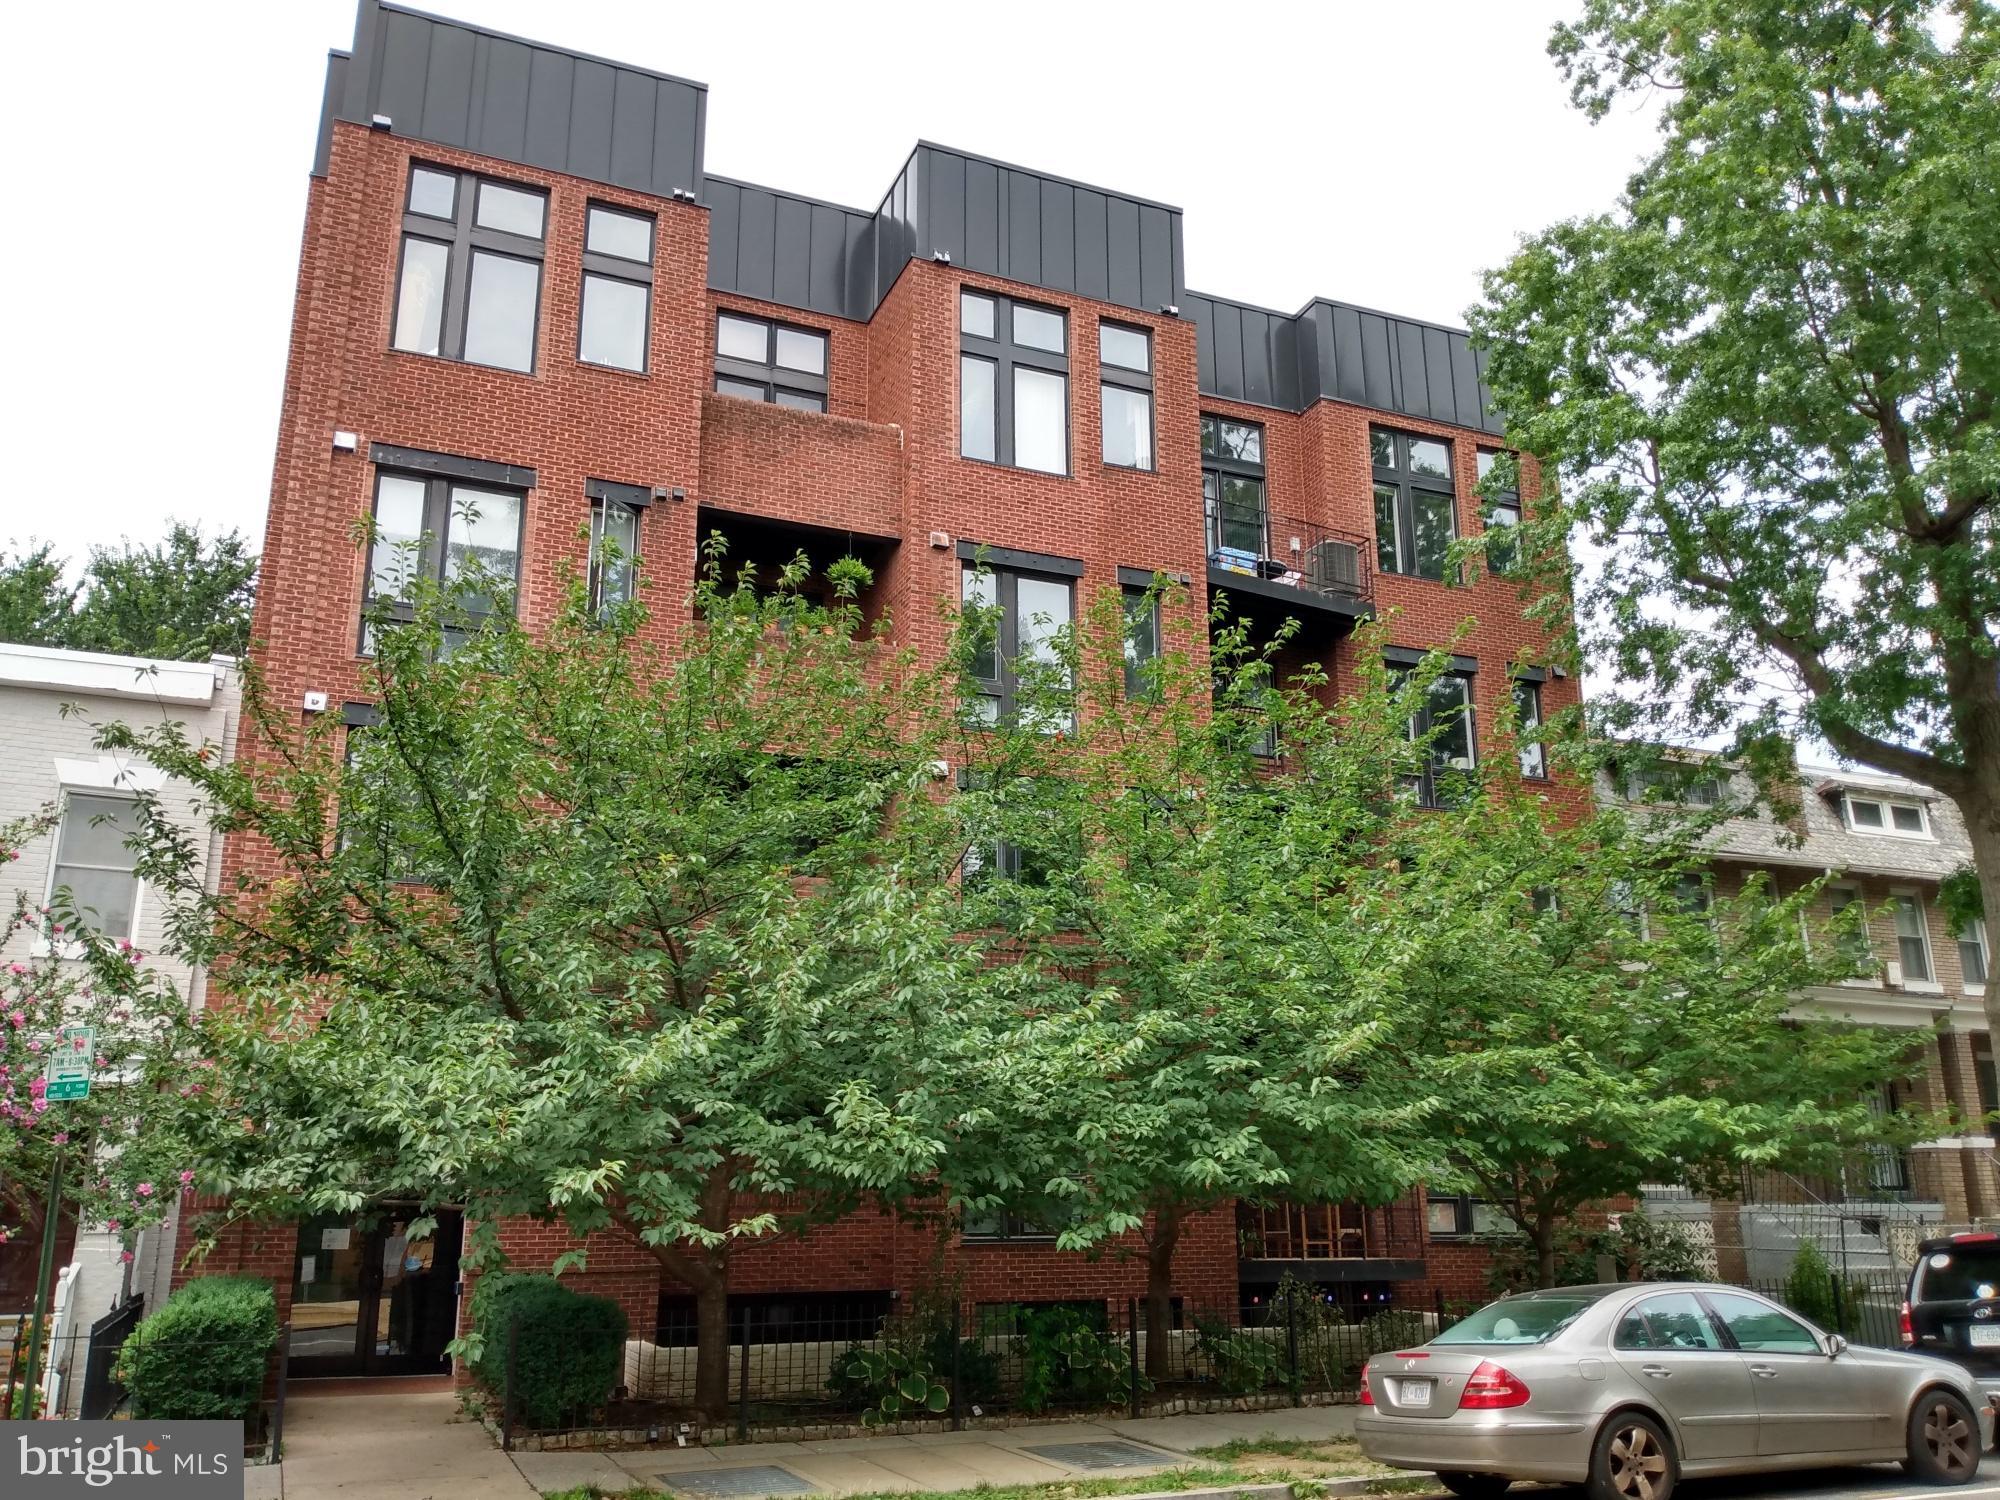 245 15th St Se #303, Washington, DC, 20003